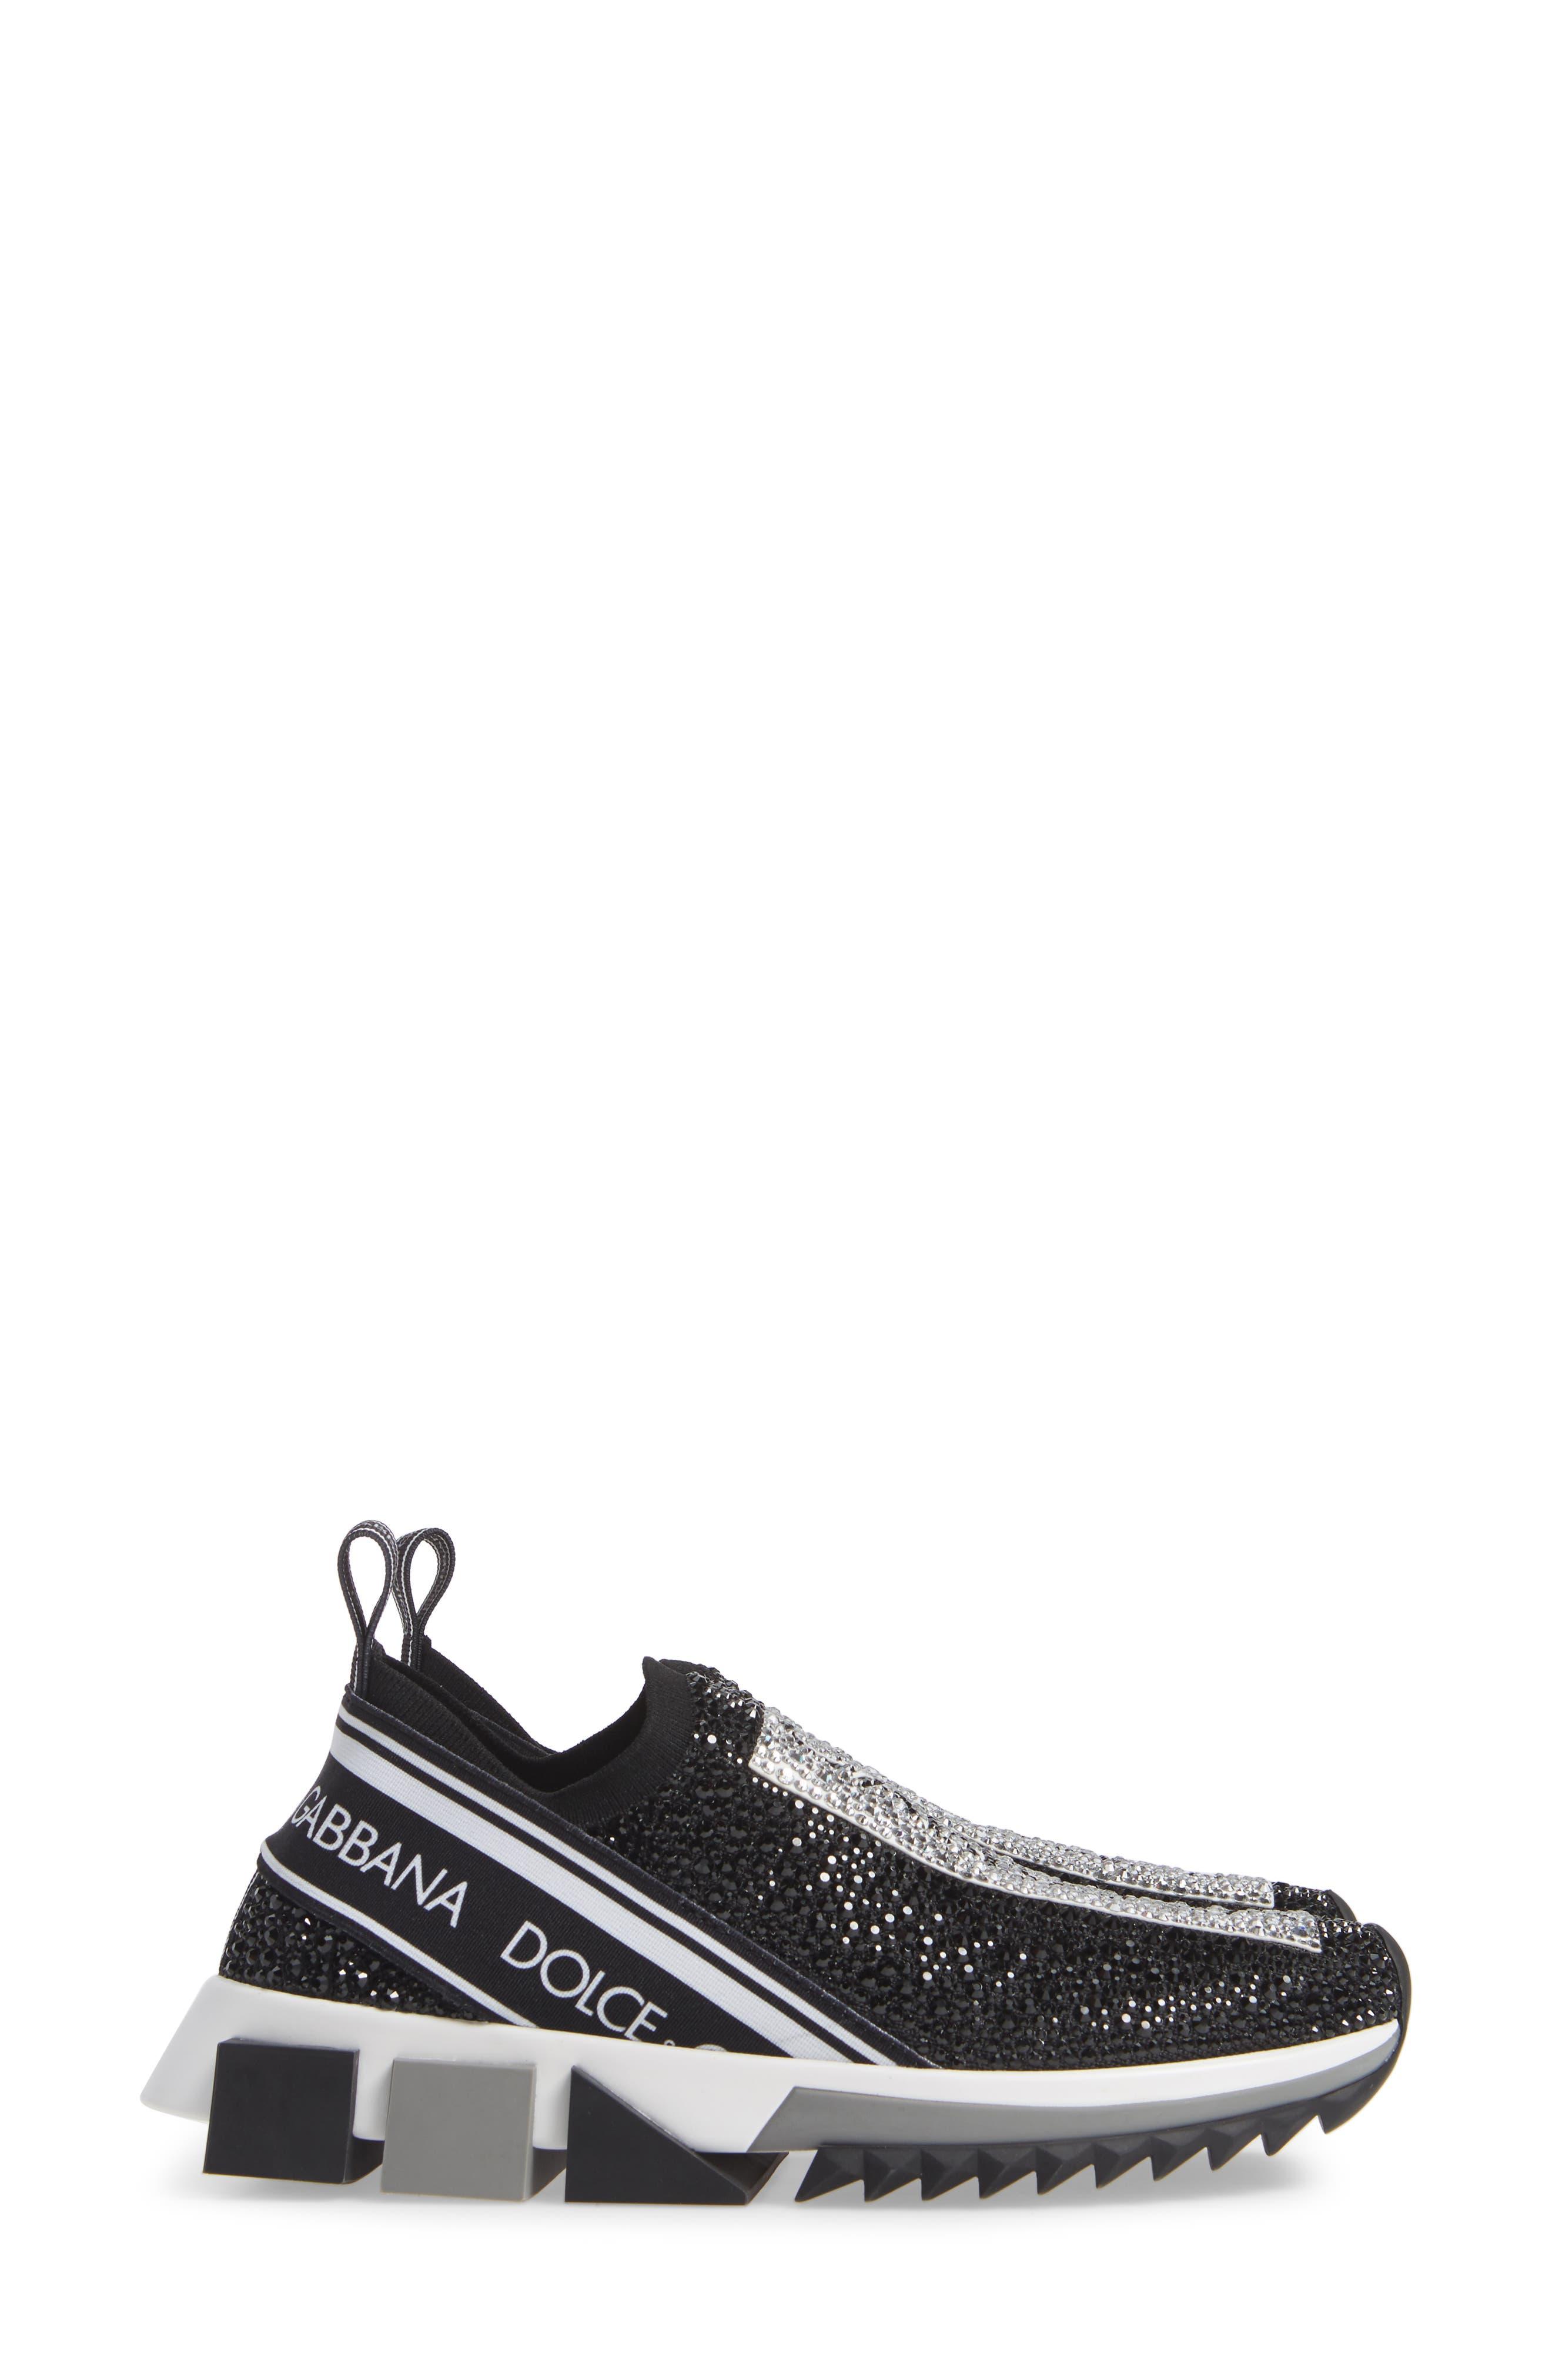 DOLCE&GABBANA, Sorrento Jeweled Logo Sneaker, Alternate thumbnail 4, color, 040